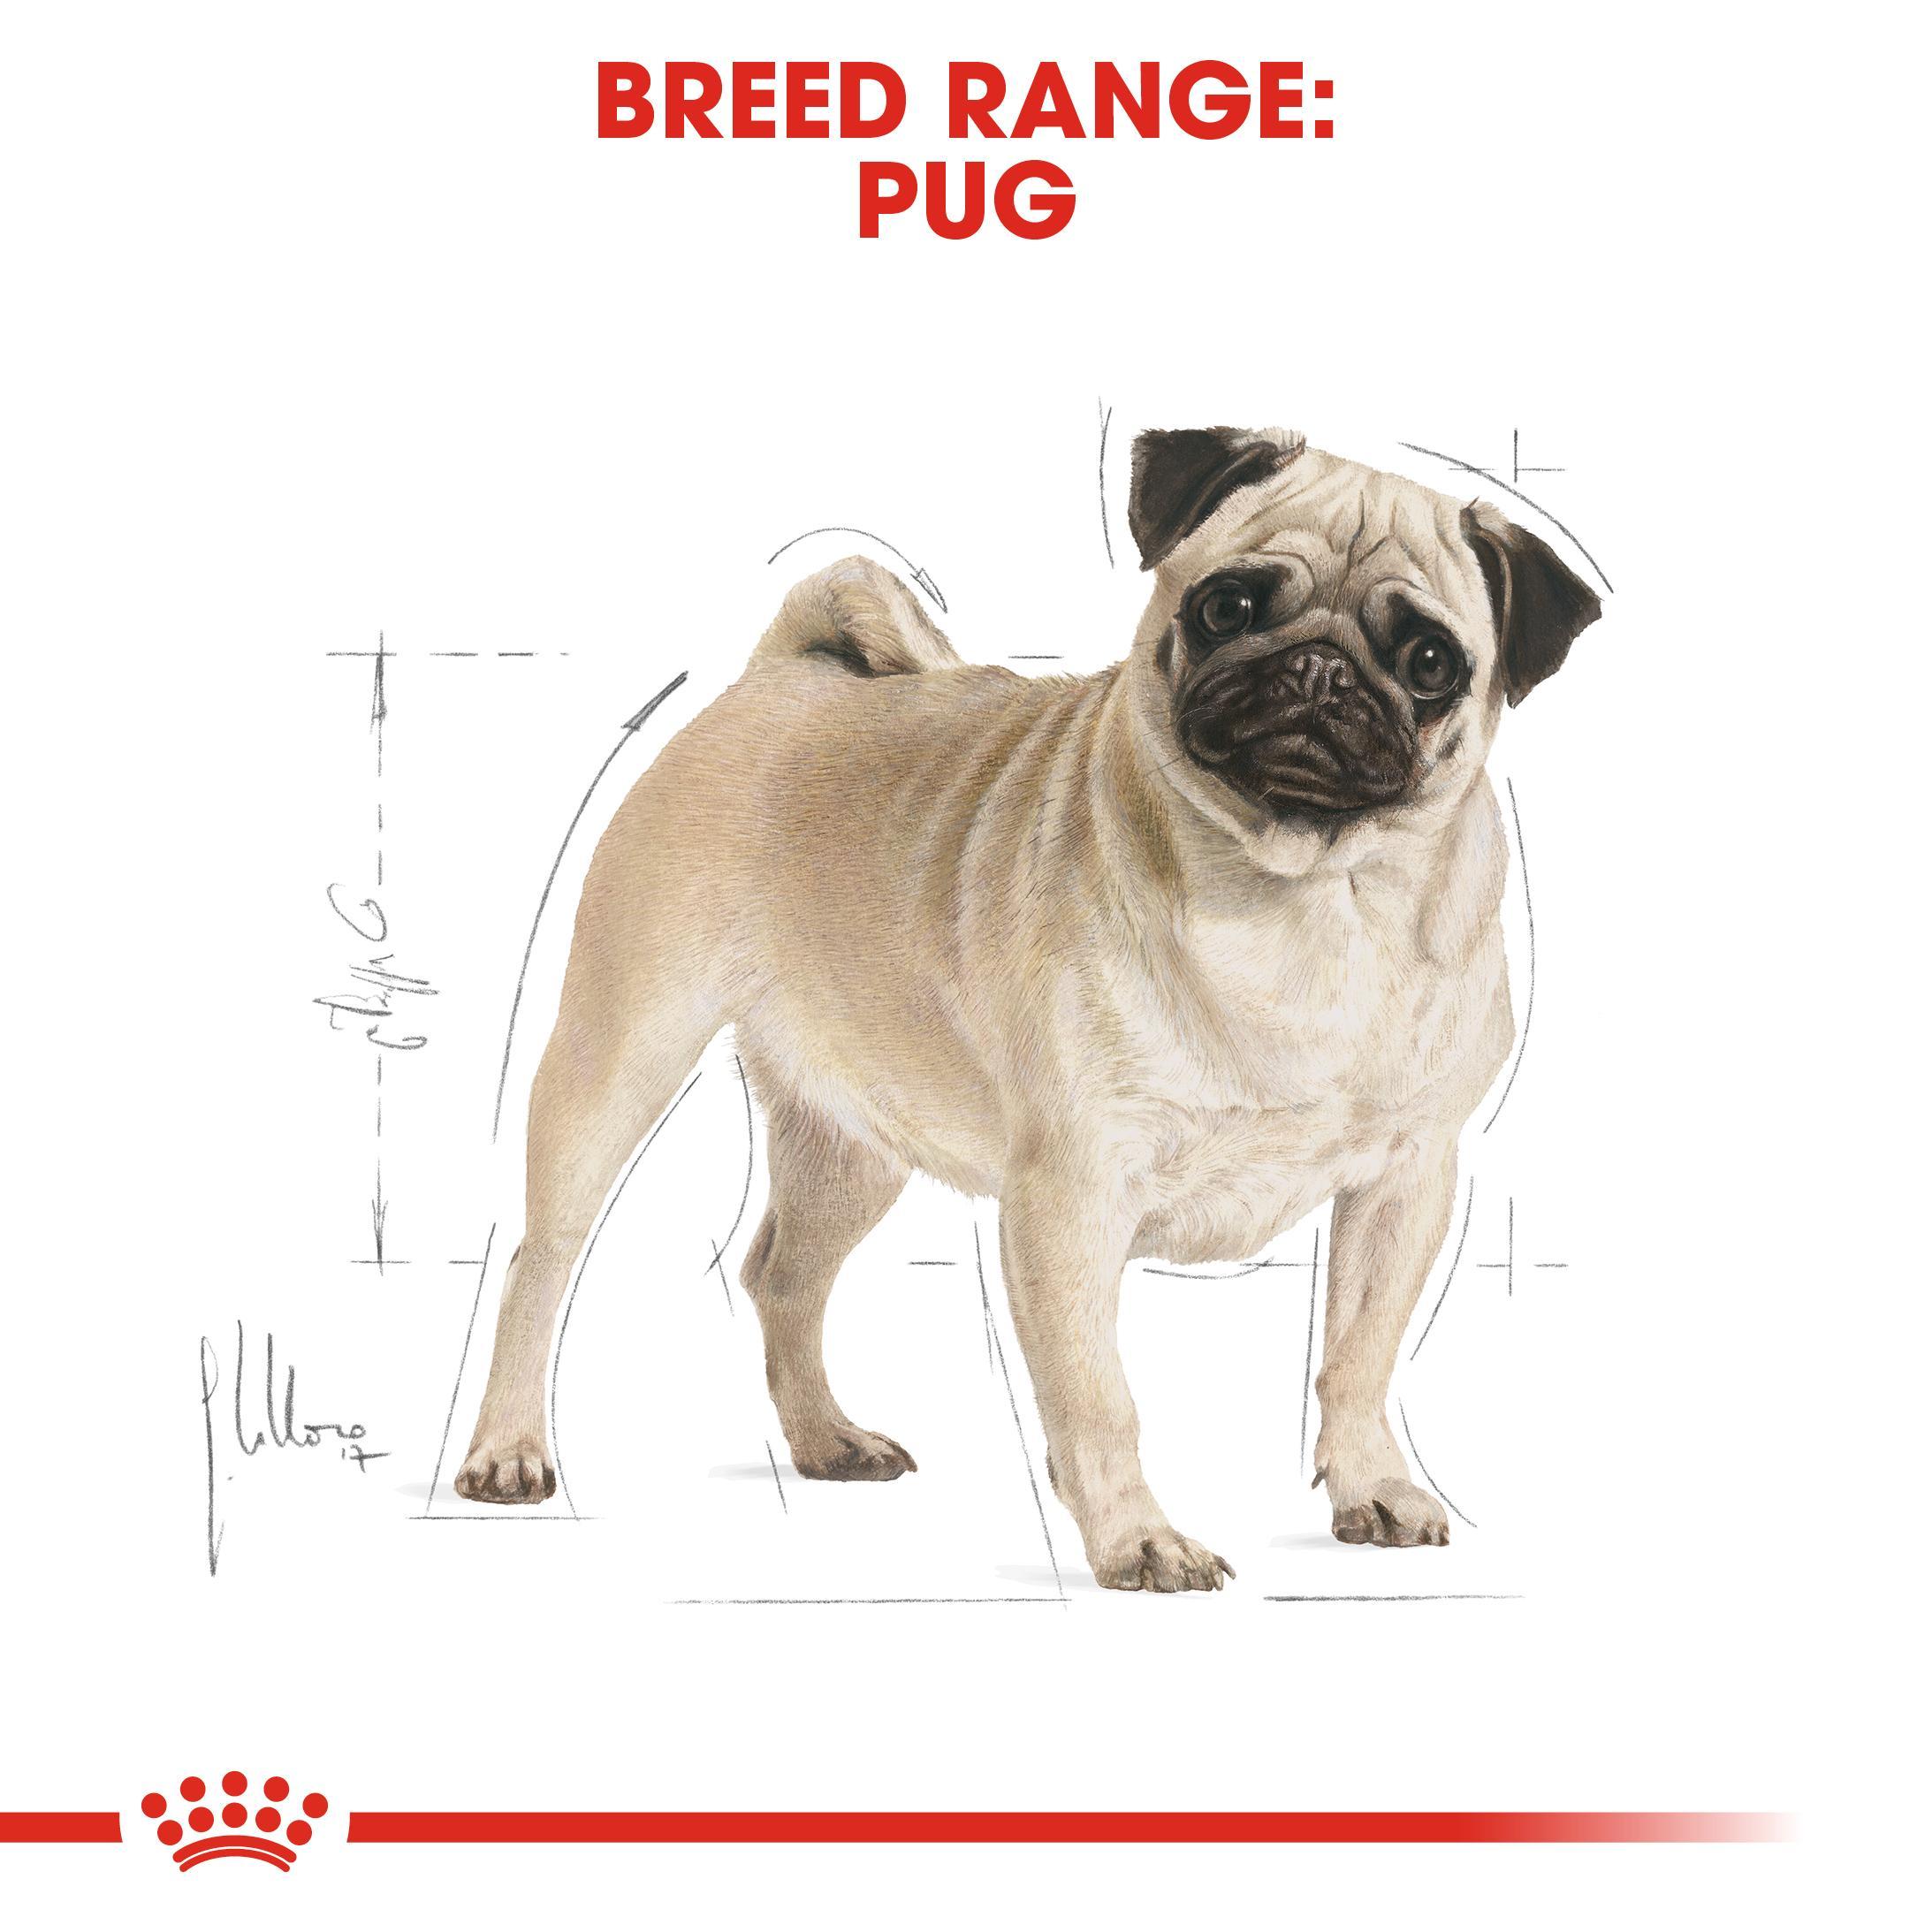 Royal Canin Pug Dry Adult Dog Food 7 5kg Buy Royal